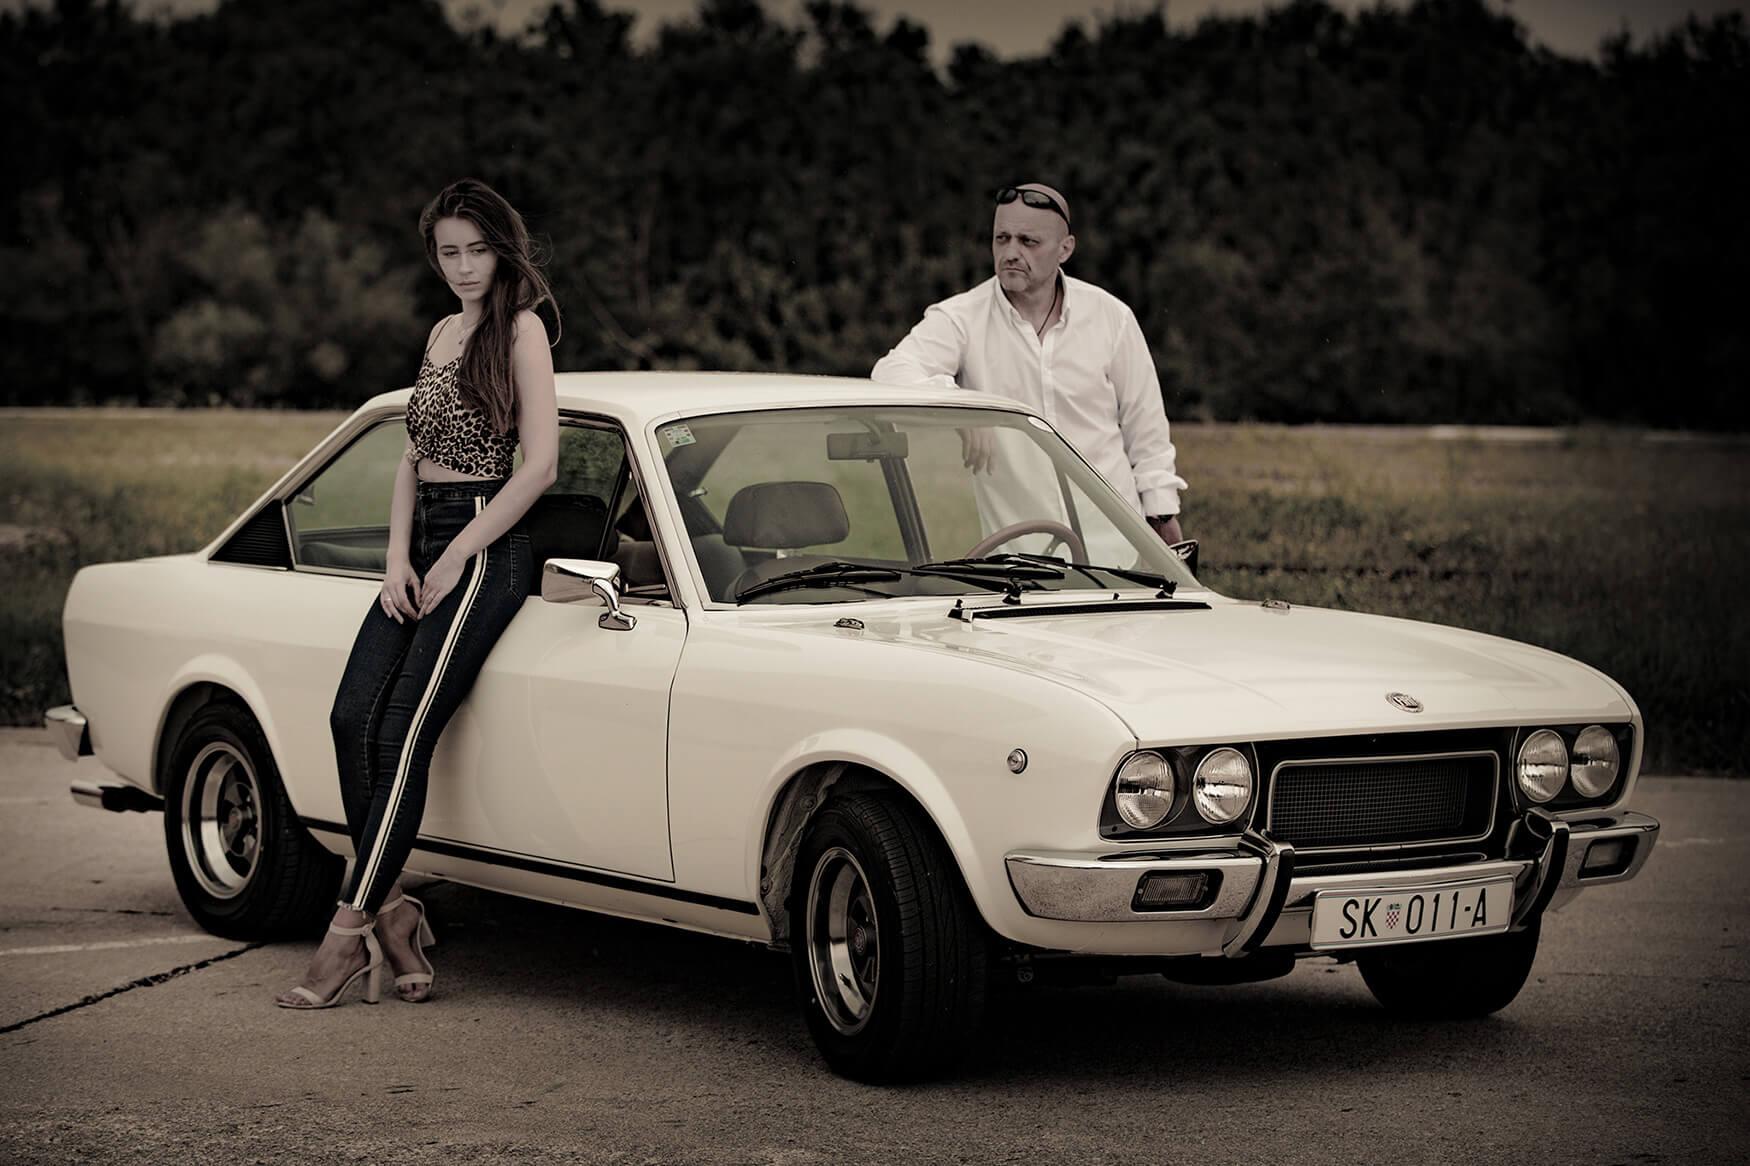 Autor-Damir-Pahić-fotoshooting-Fotoklub-Sisak